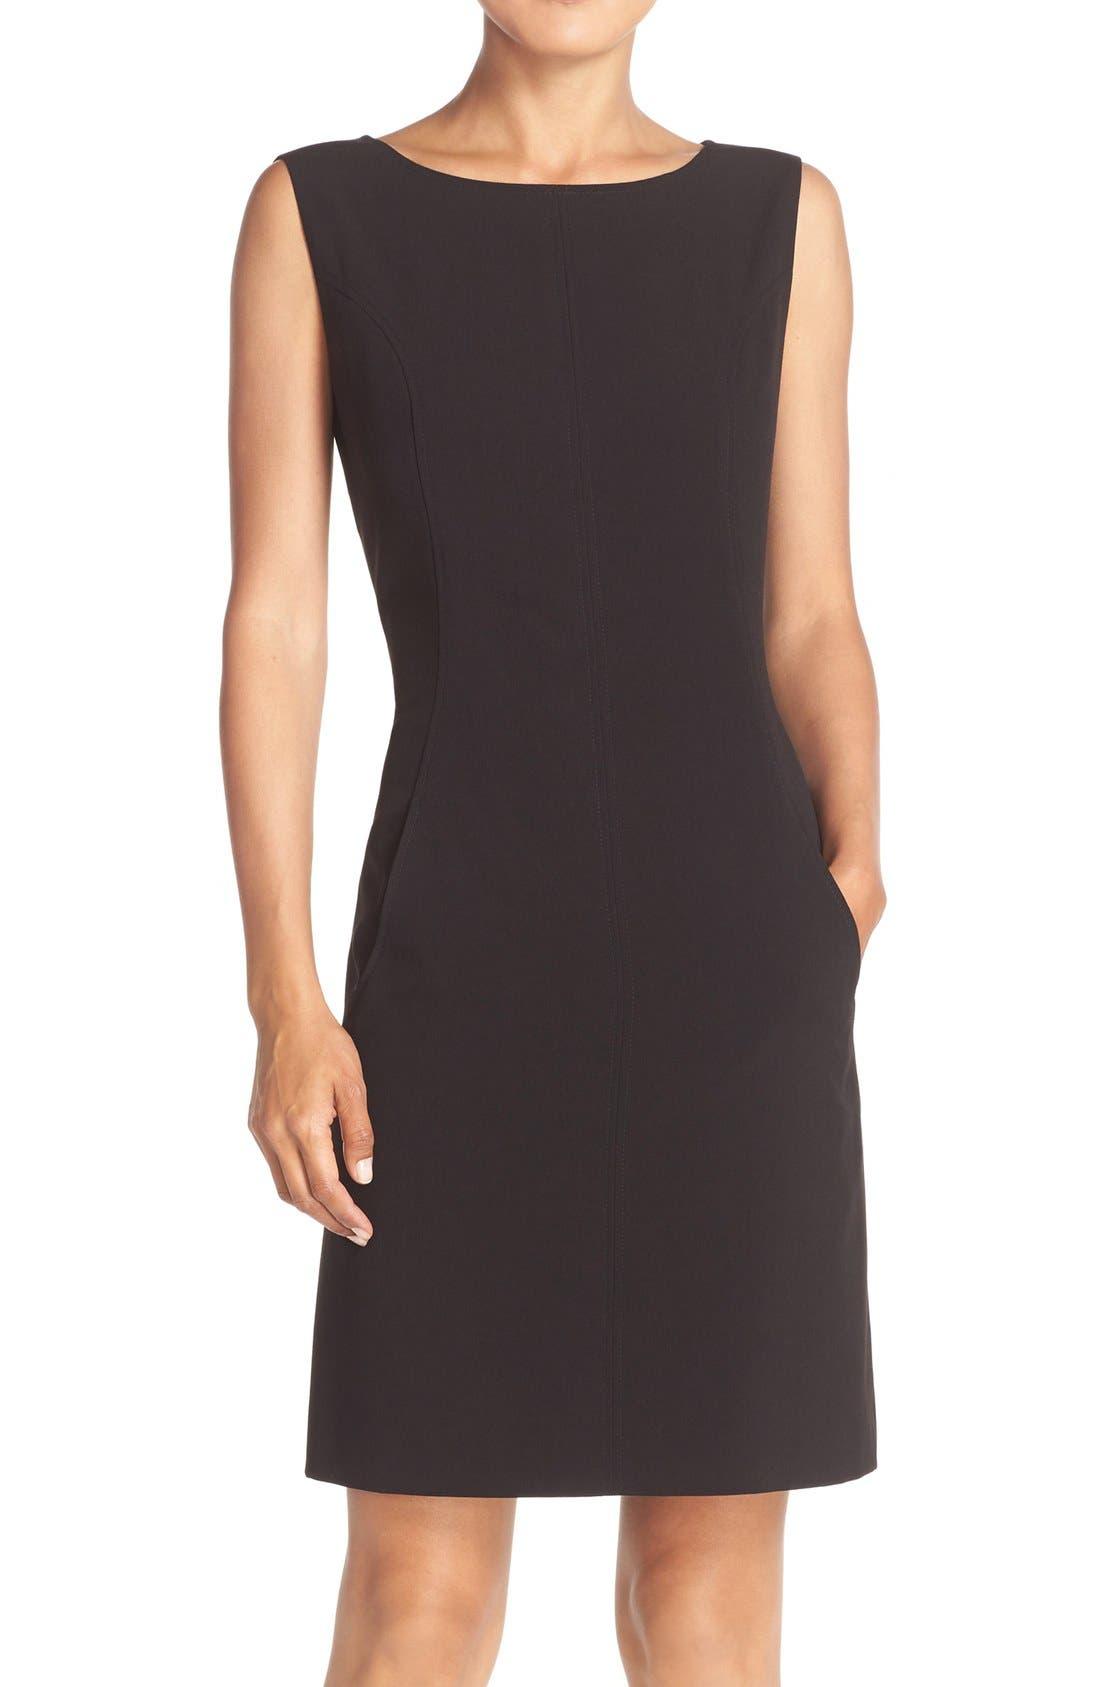 Alternate Image 1 Selected - Tahari Seamed Woven A-Line Dress